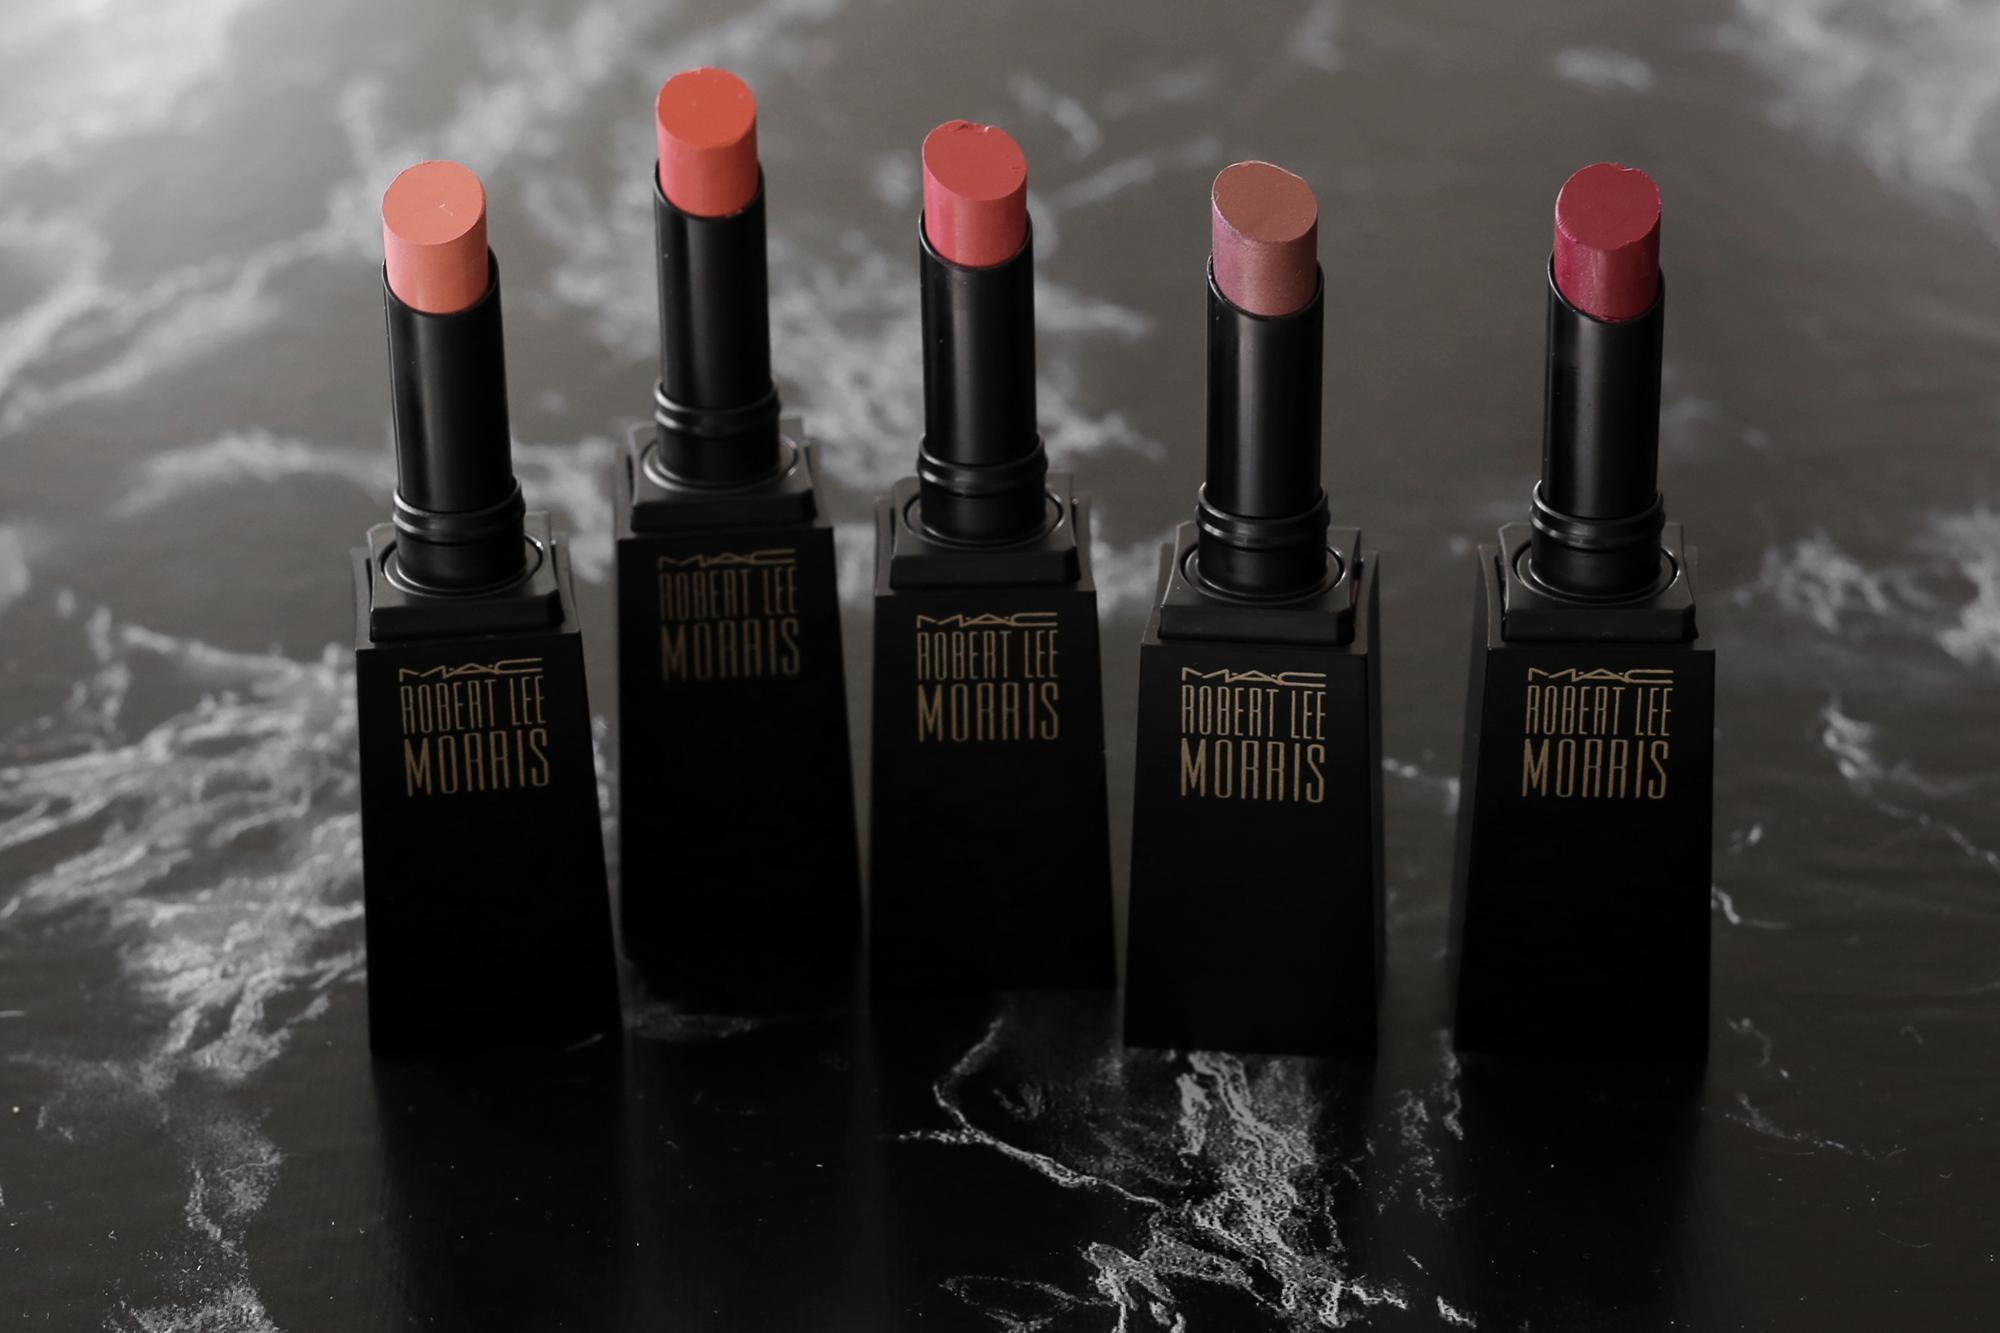 MAC x Robert Lee Morris makeup collection 2017 lipstick, blush, powder, compact, brush, beauty_5457.jpg